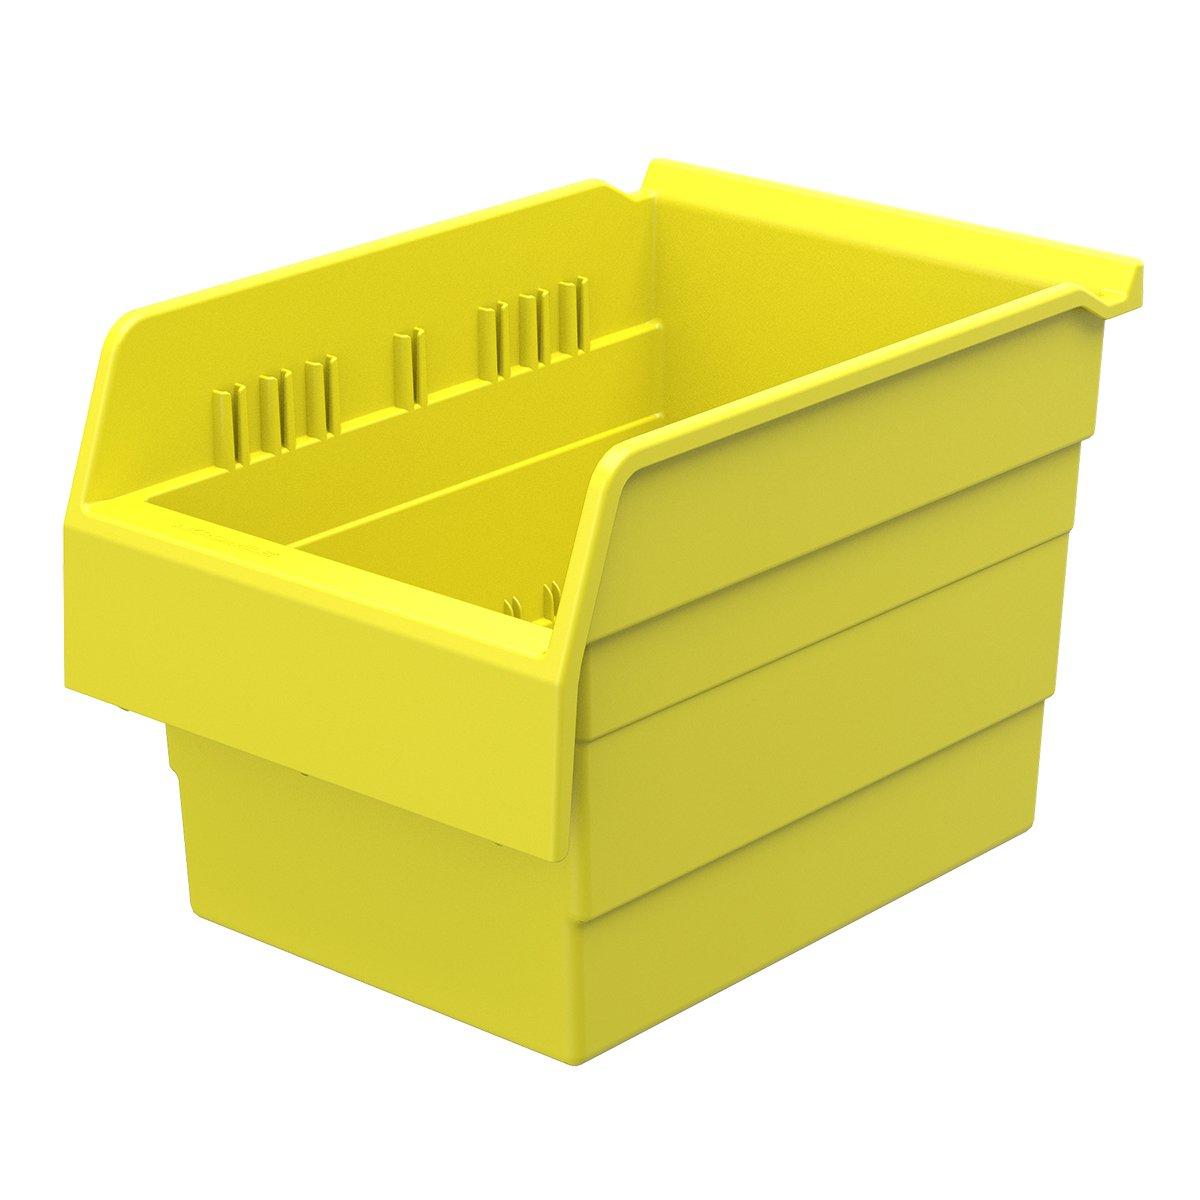 Akro-Mils 30880 ShelfMax 8 Plastic Nesting Shelf Bin Box, 12-Inch x 8-Inch x 8-Inch, Yellow, 8-Pack